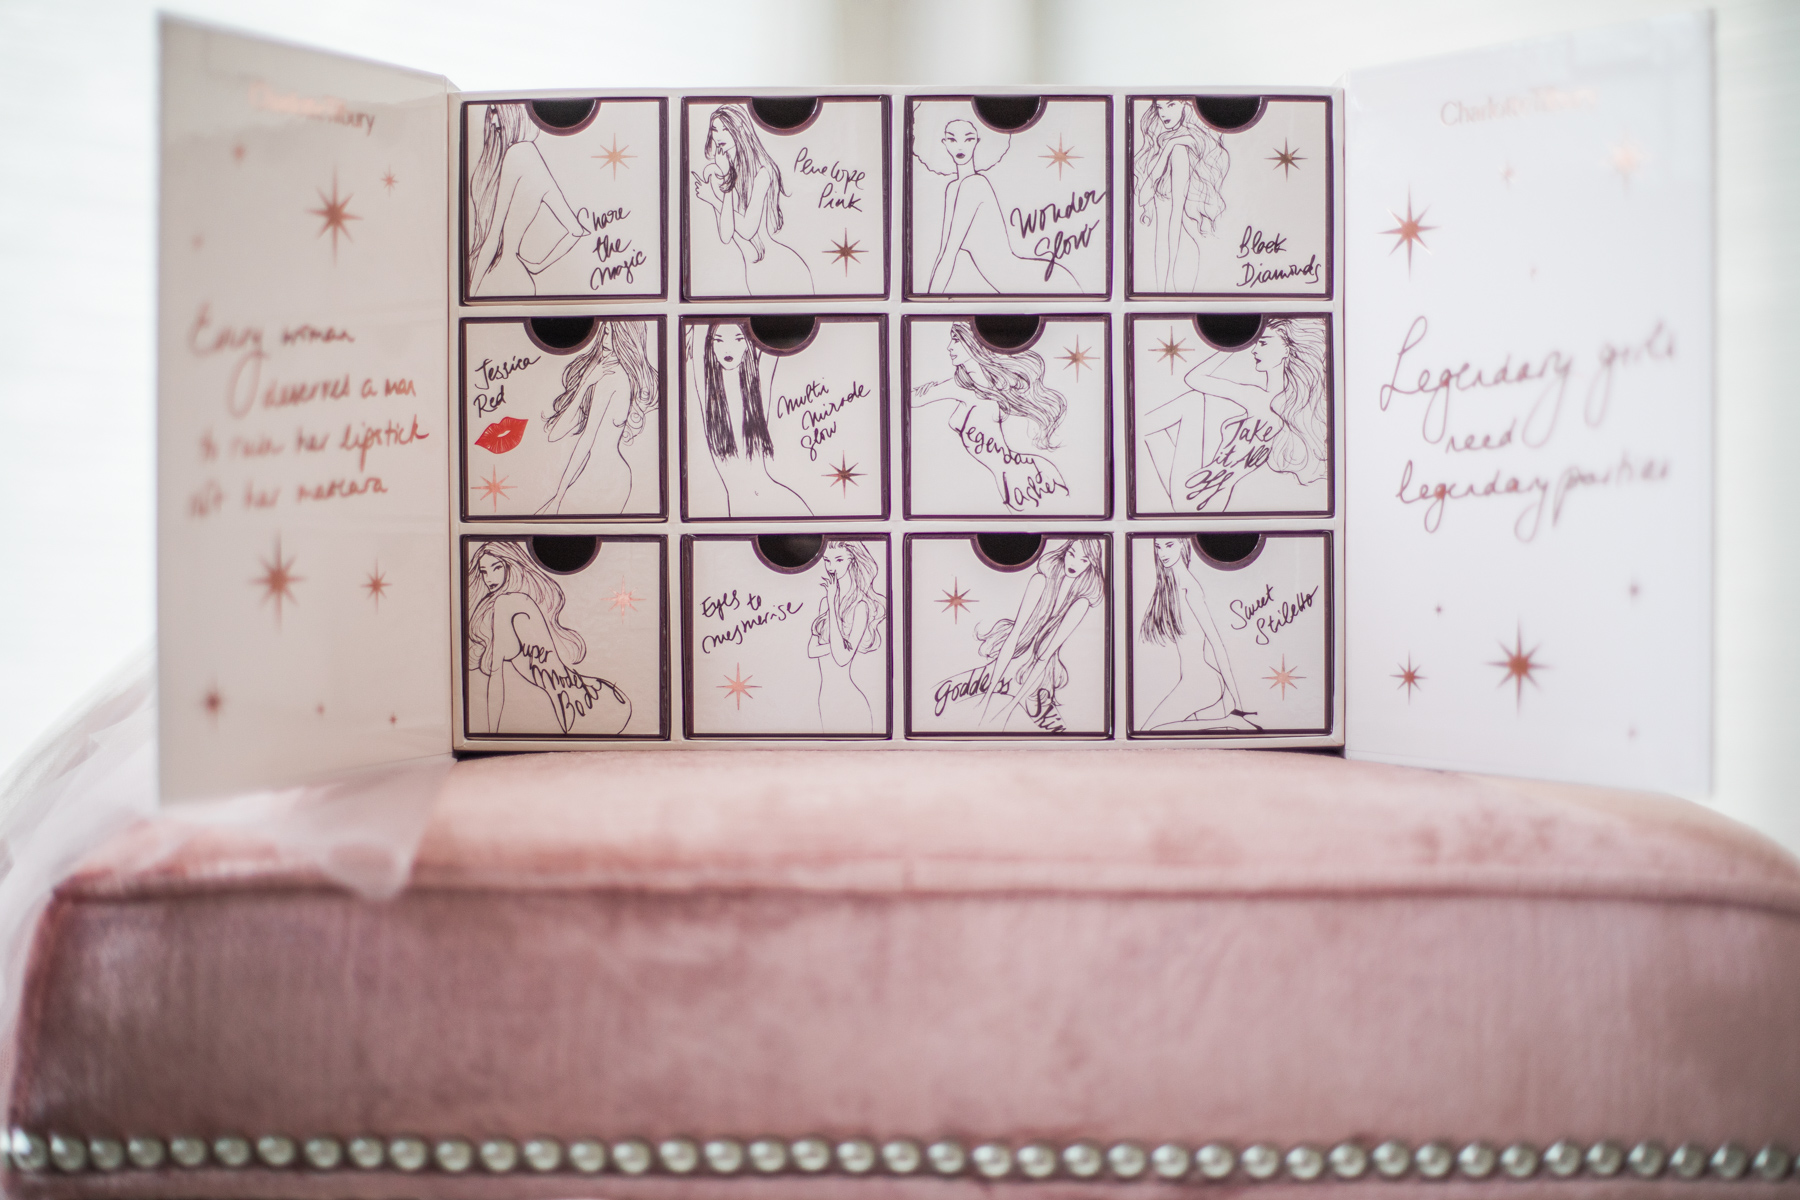 Charlotte Tilbury, Holiday Gift Set, NOTJESSFASHION, NYC, Top Fashion Blogger, Lifestyle Blogger, Travel Blogger